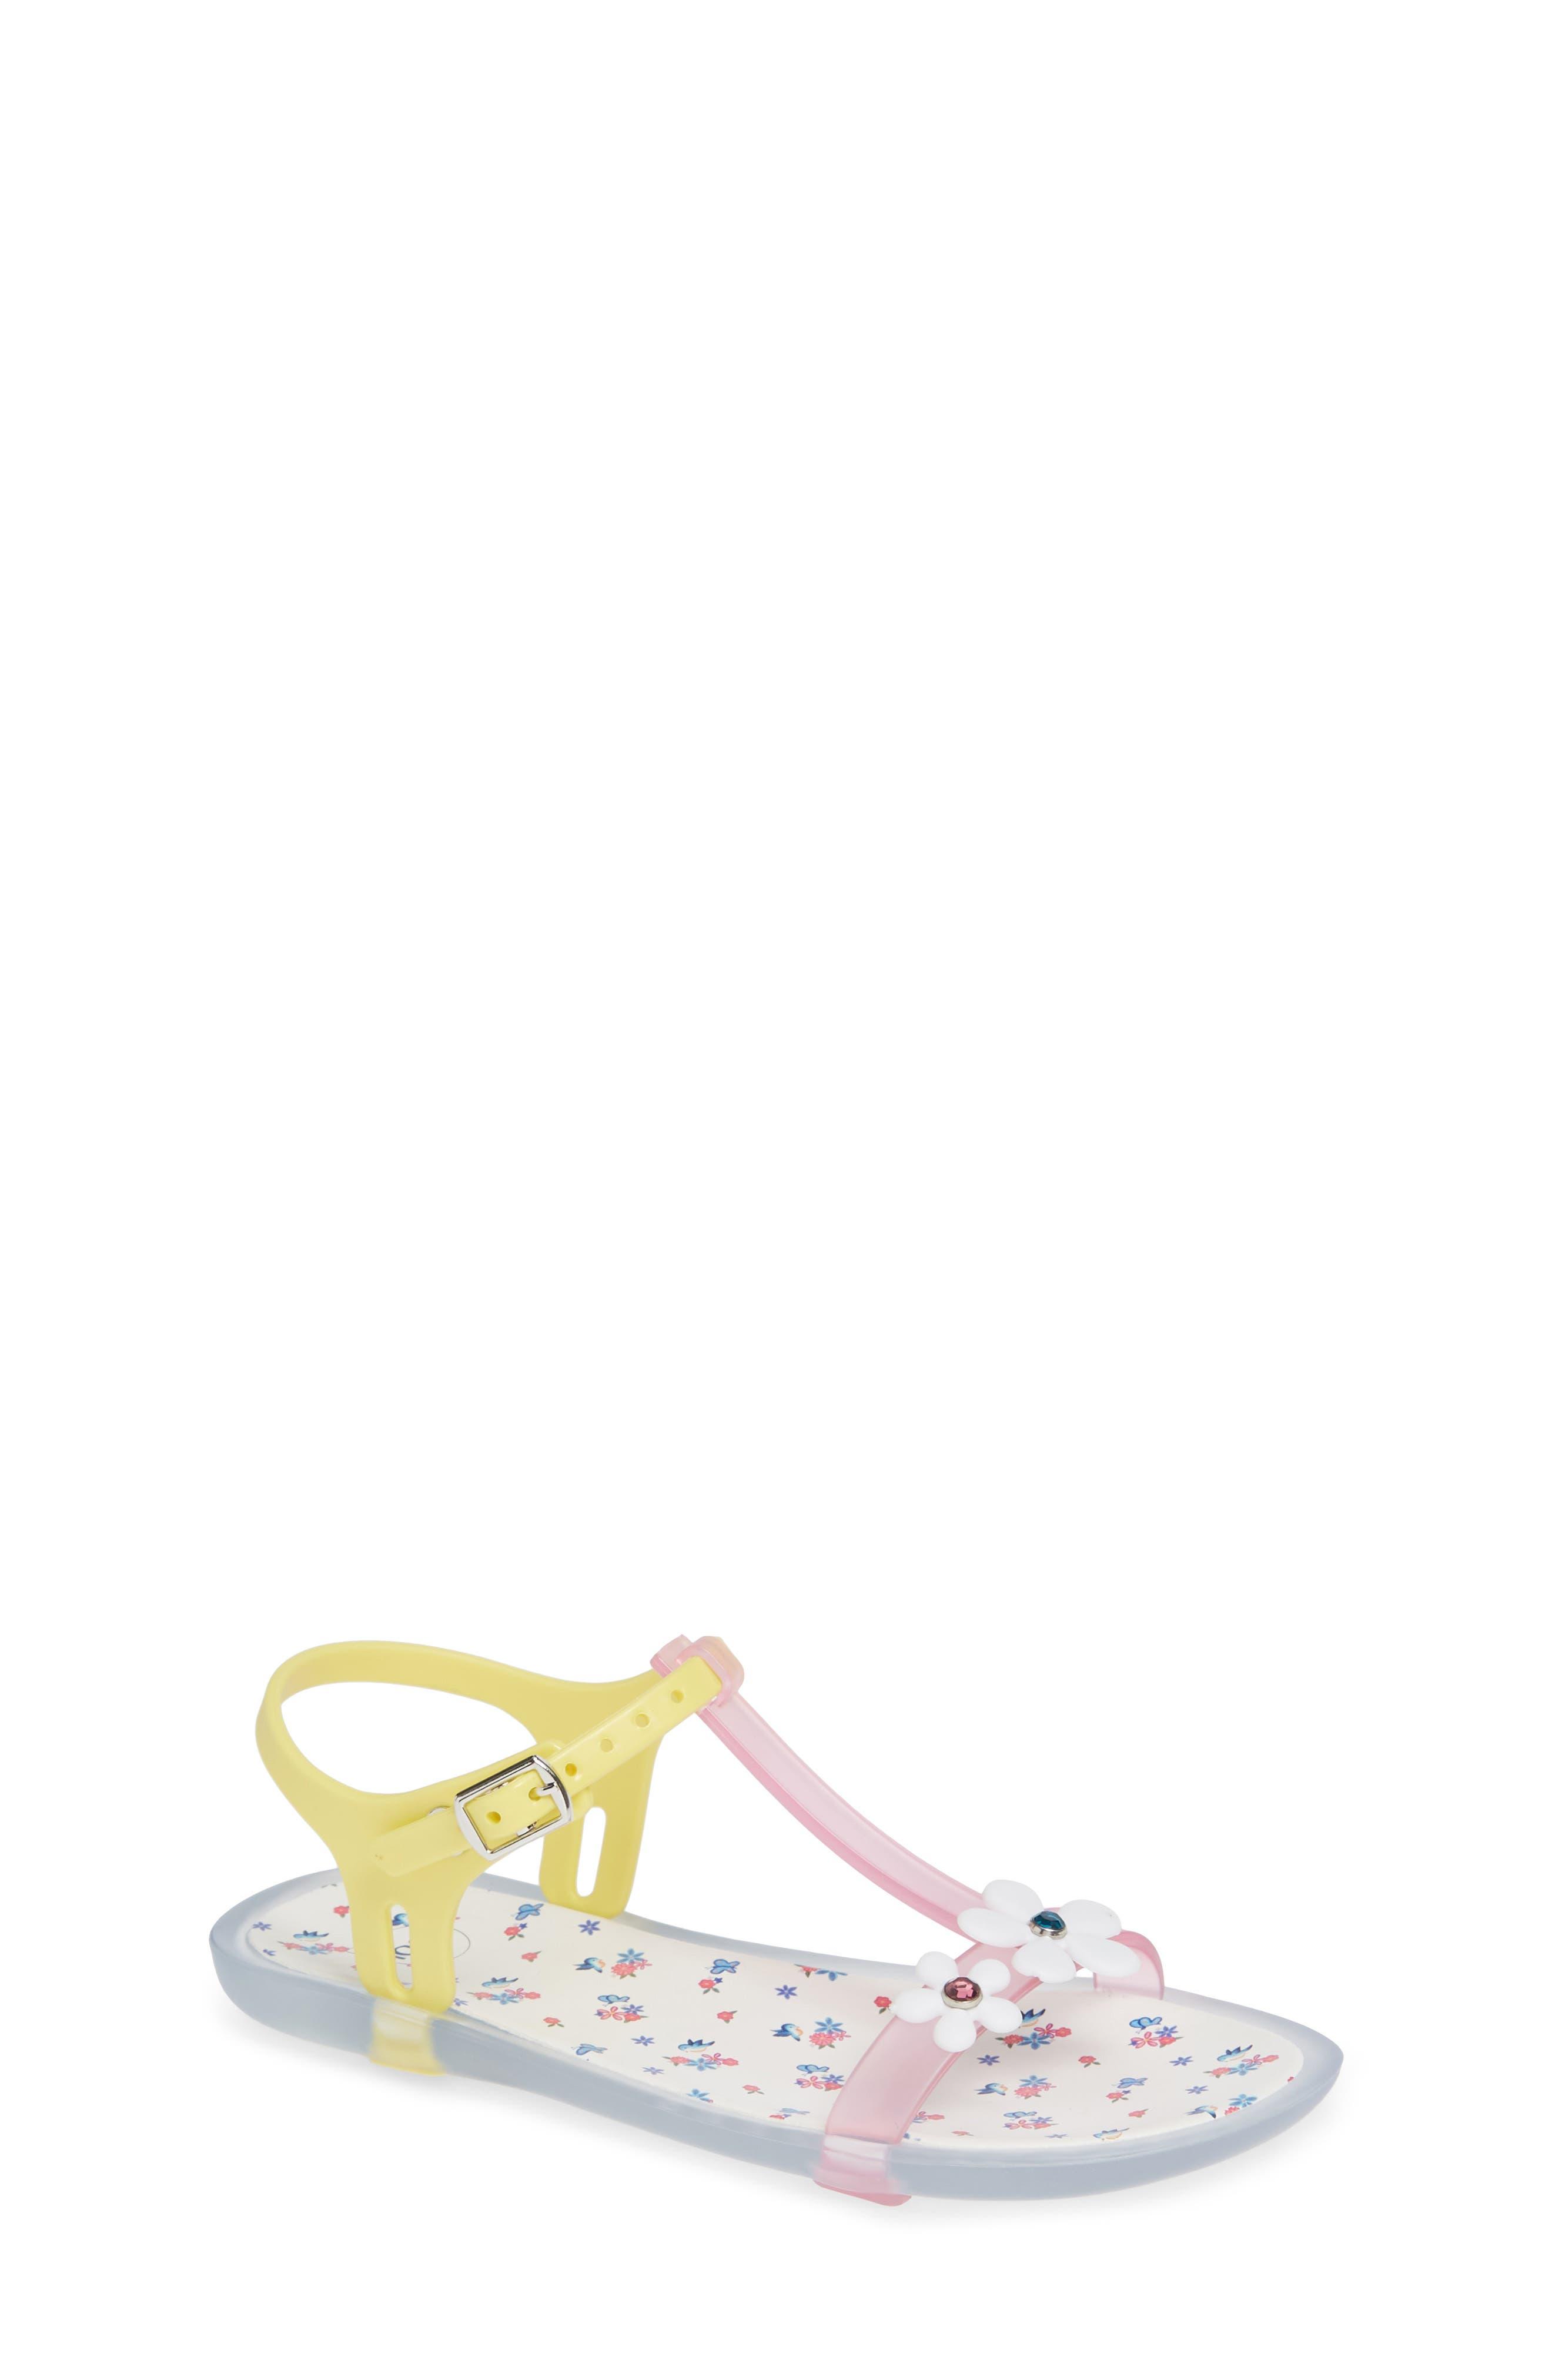 Tricia T-Strap Sandal,                         Main,                         color,